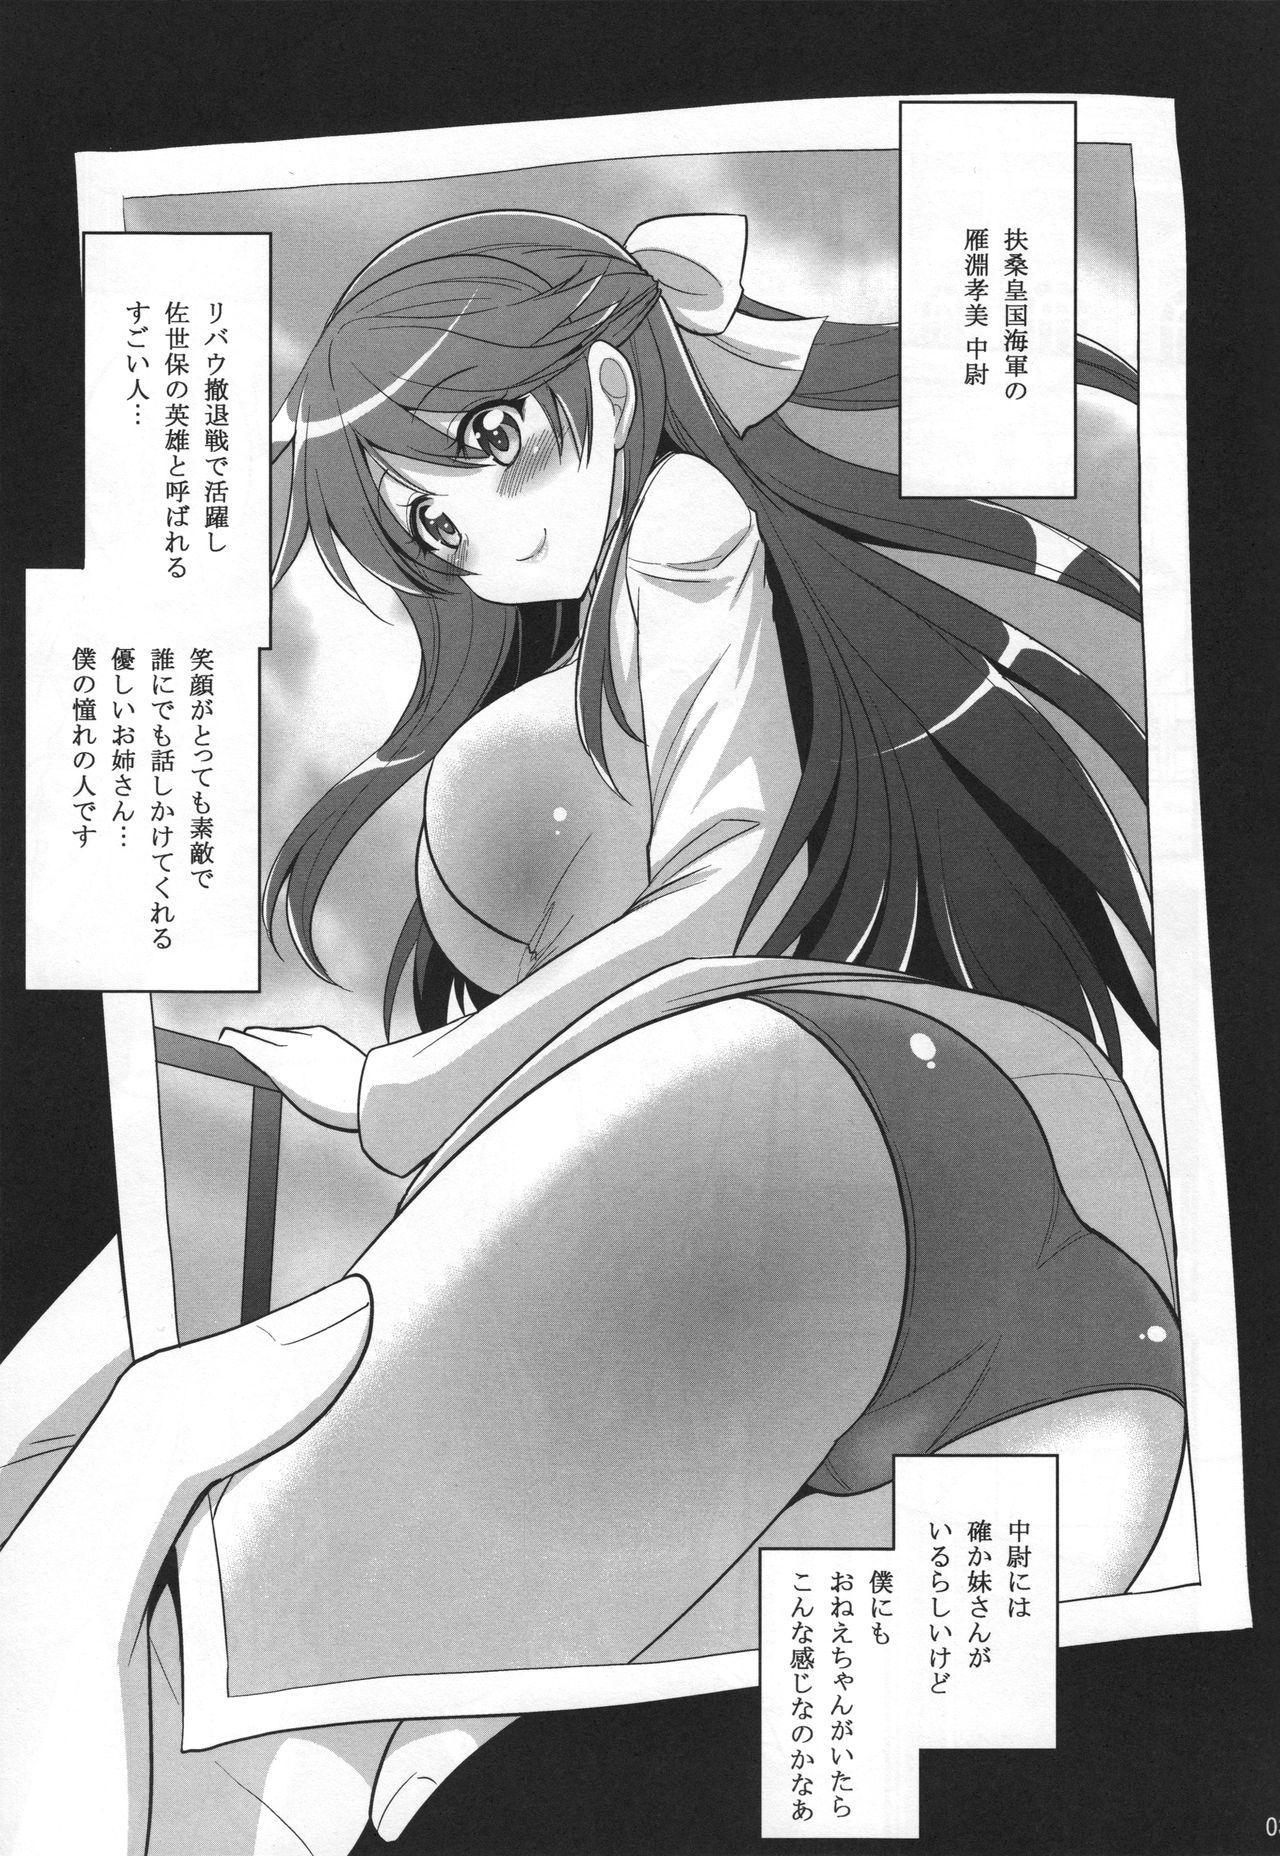 Onee-chan to Shota no Witch Night 1